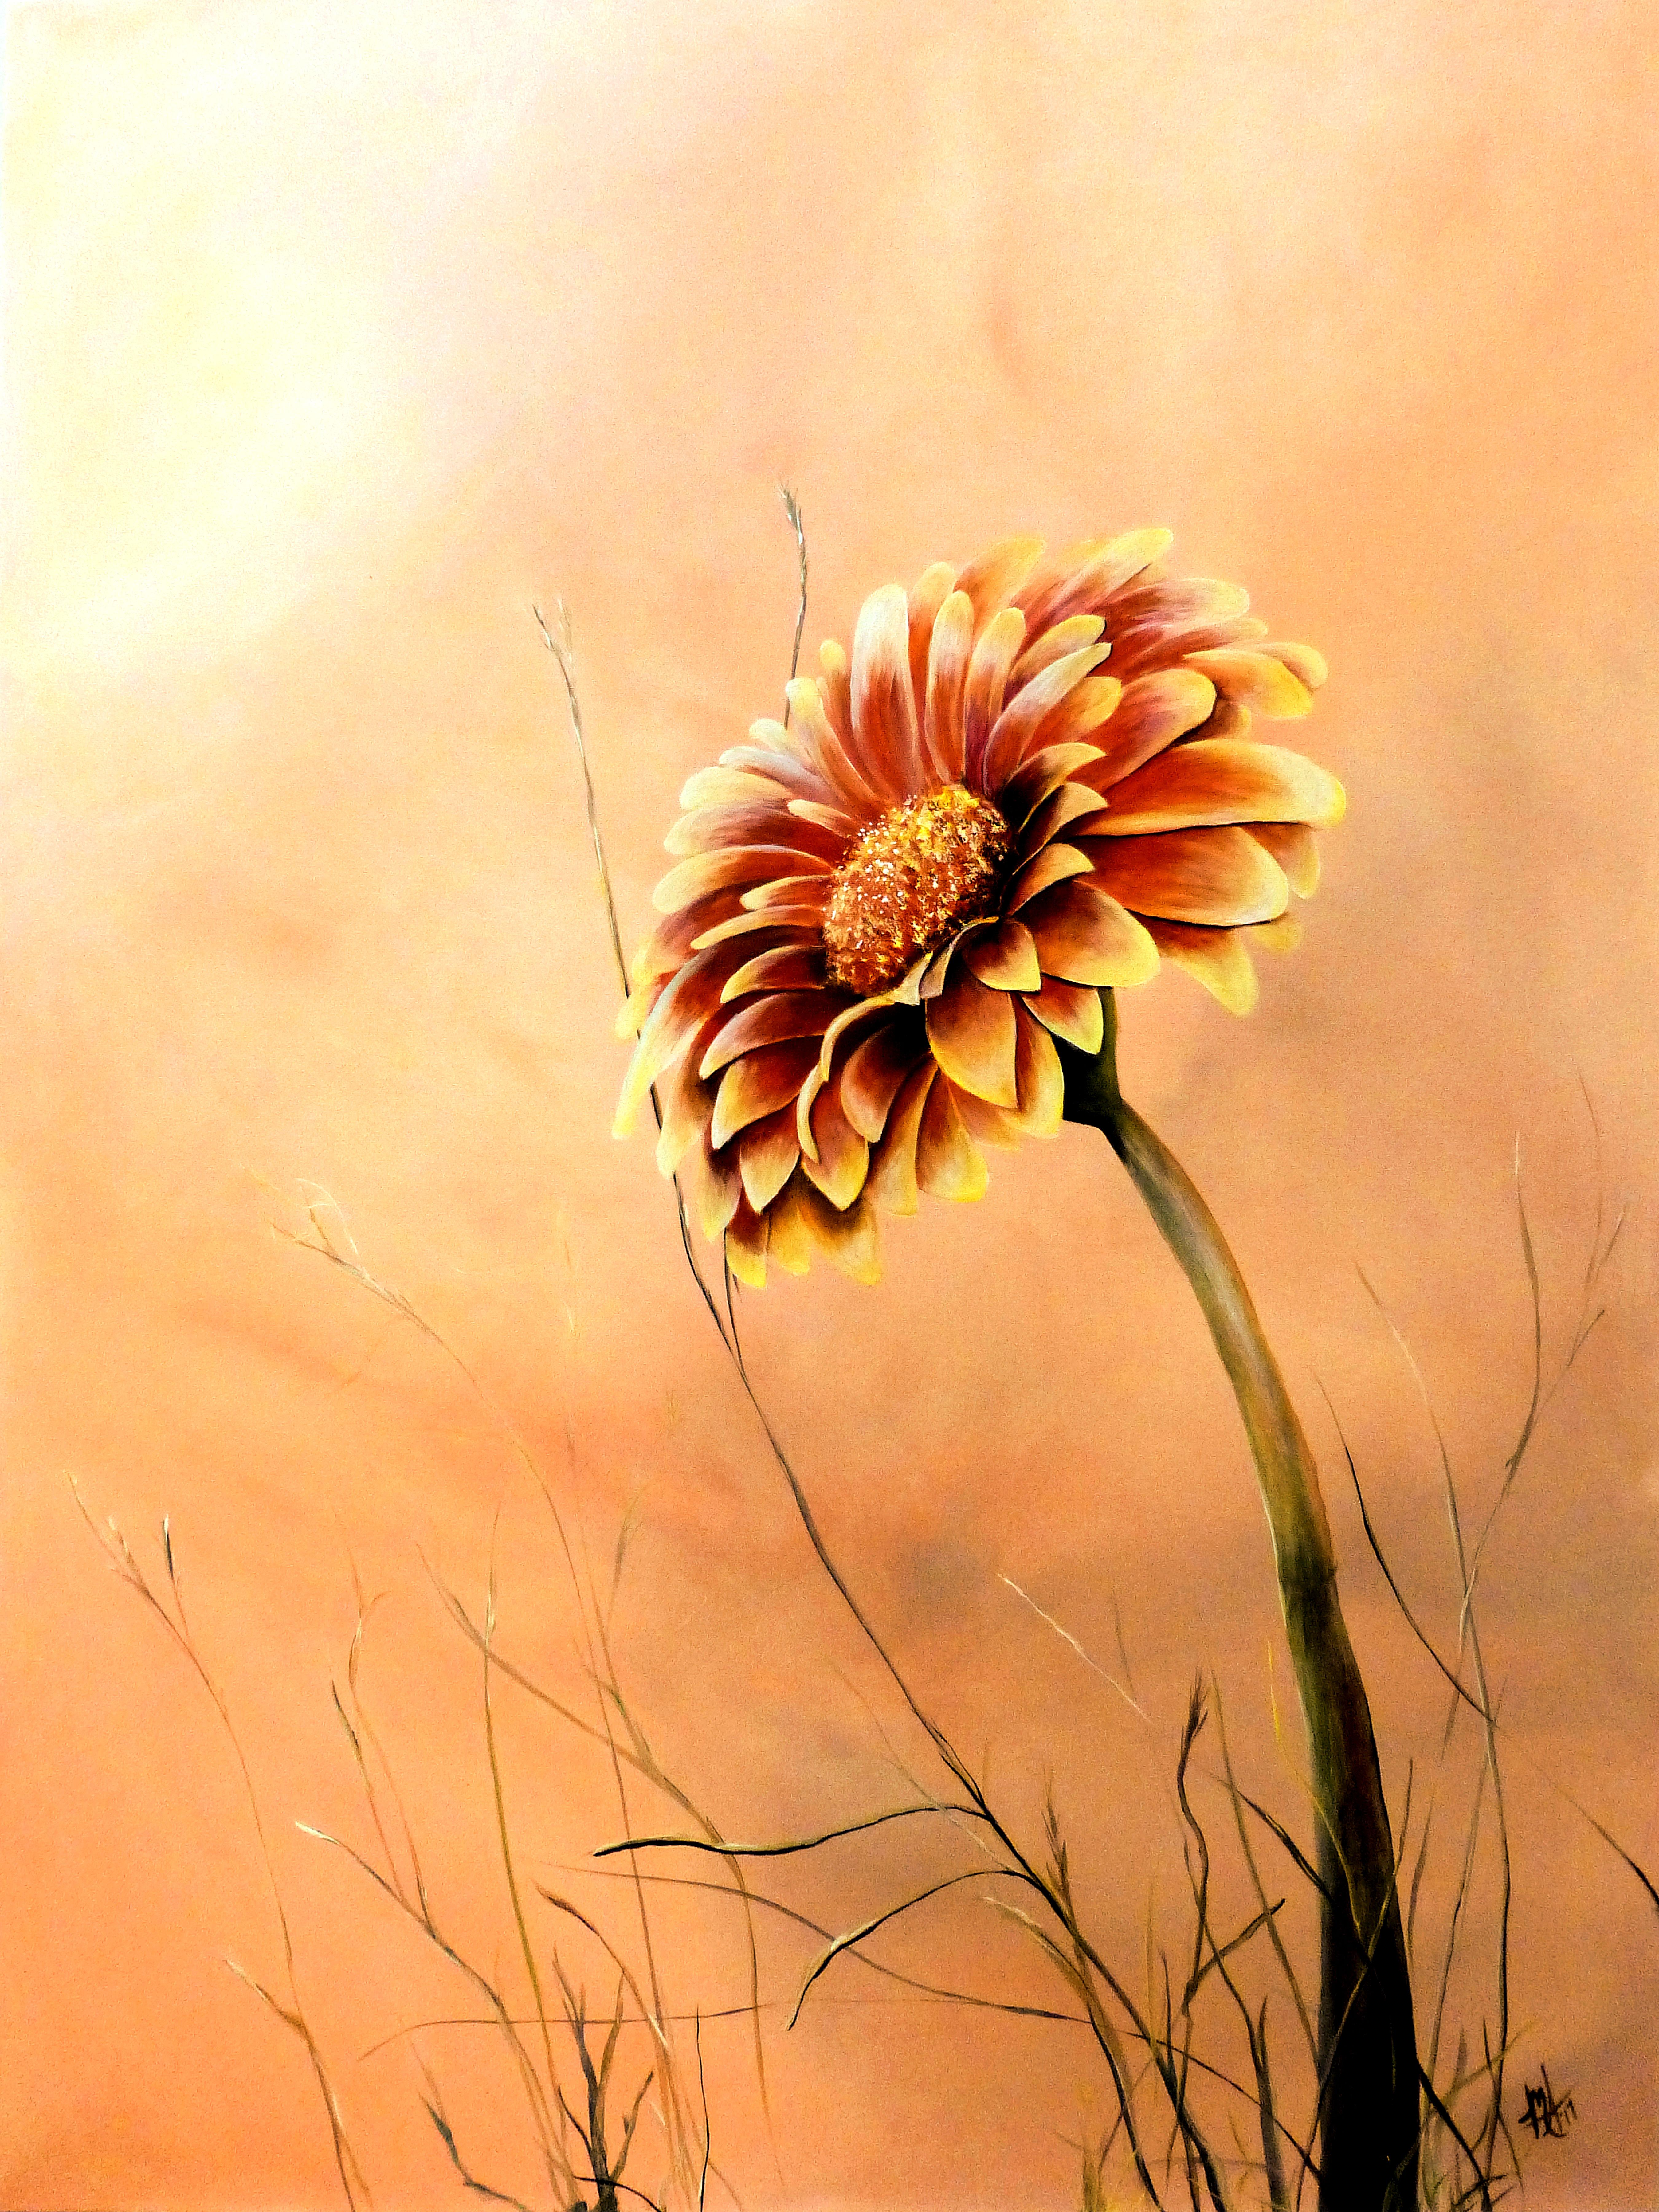 Michelle Iglesias Artwork: red and yellow gerbera daisy | Original ...